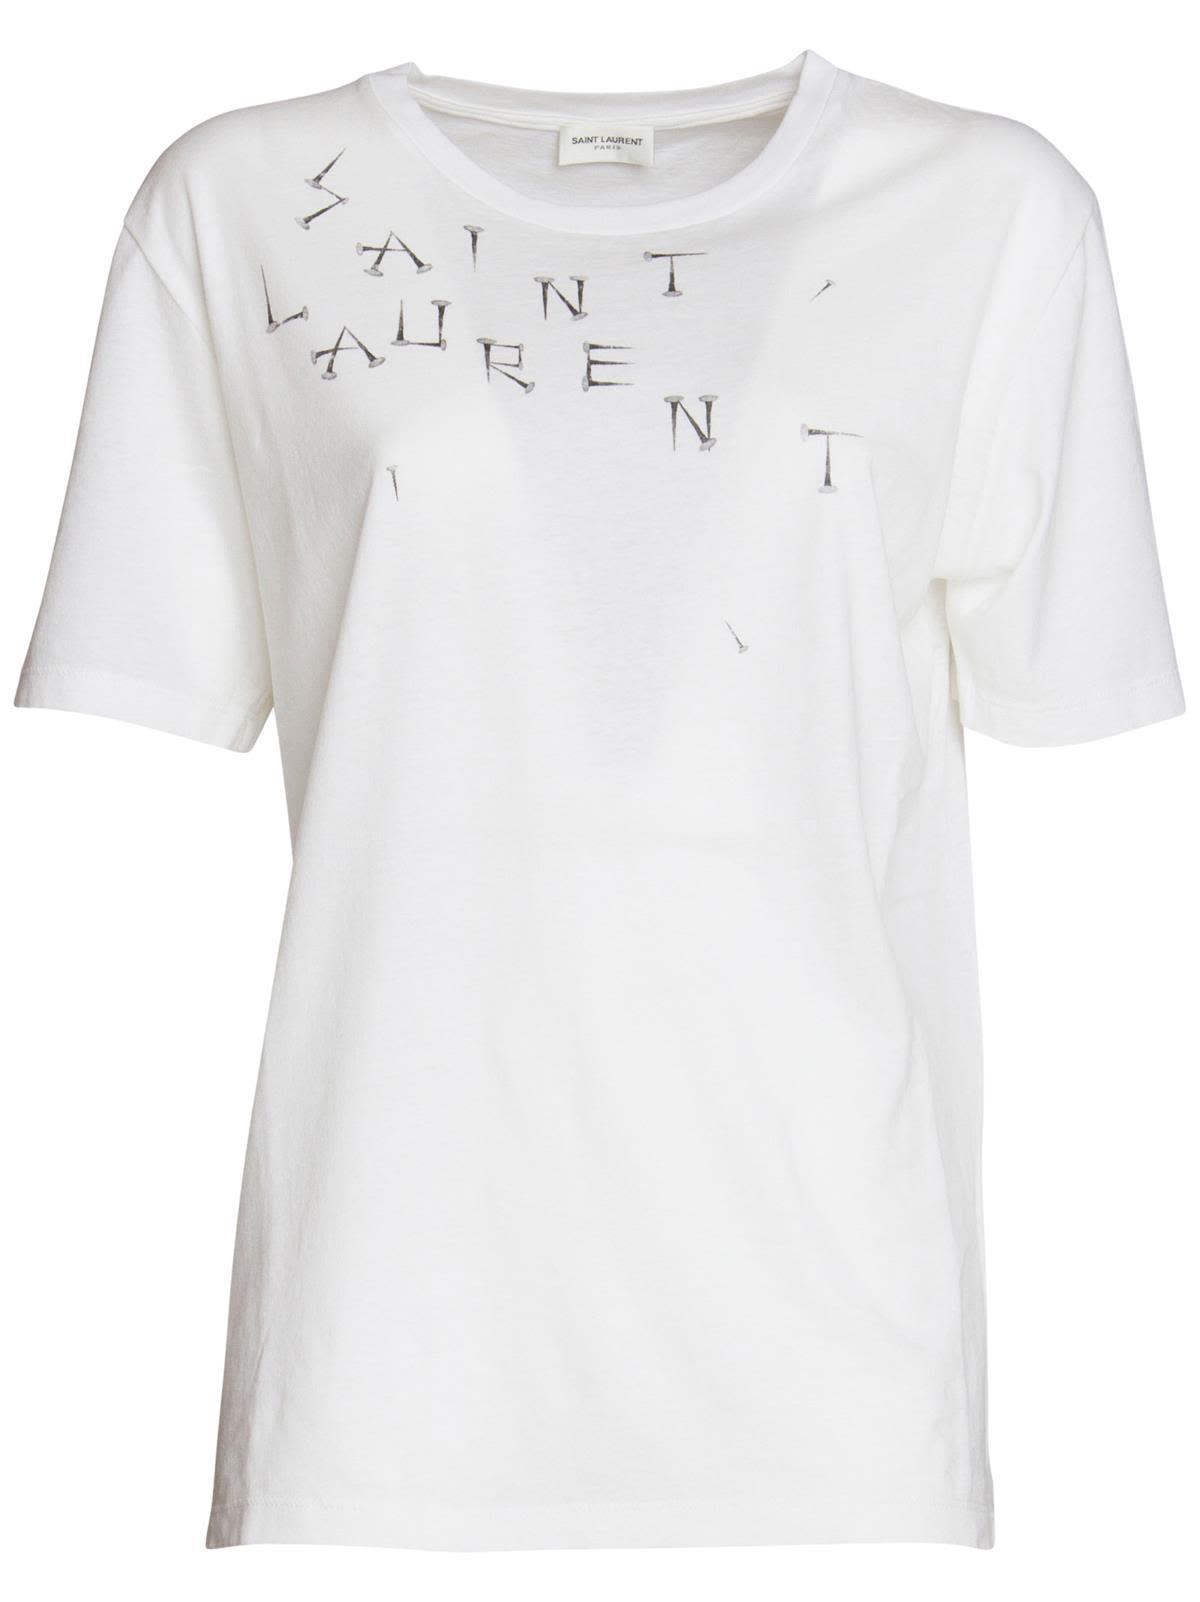 8b6c105092 Studs T-Shirt In White in Bianco